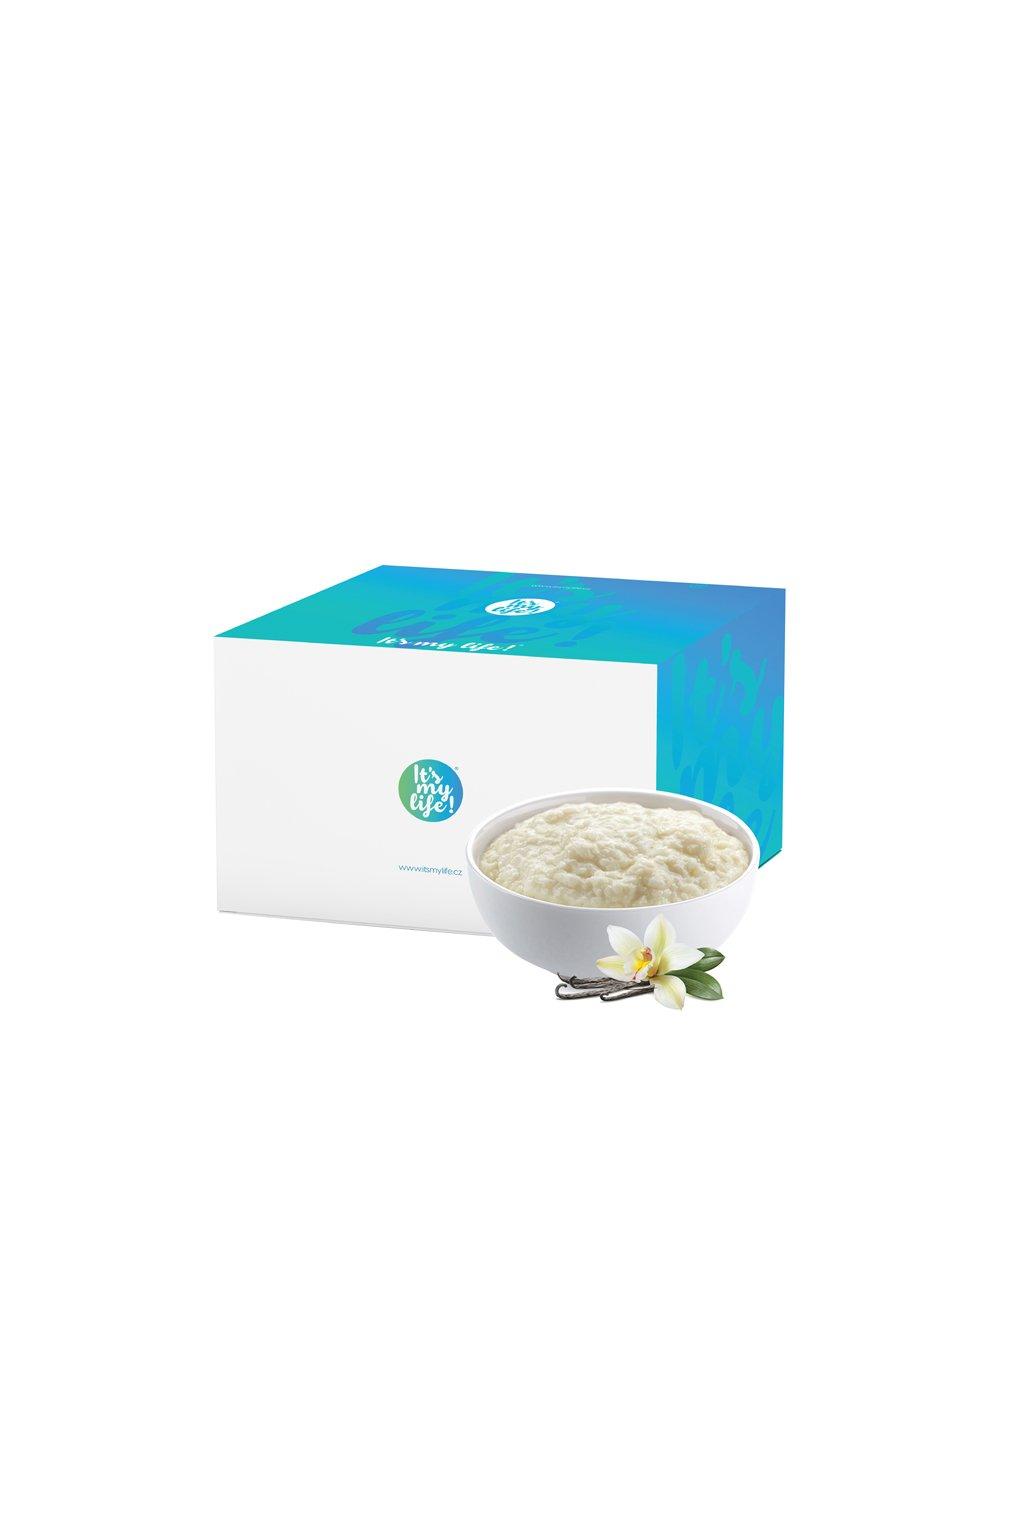 Vanilkové proteínové kaše, 800g (20porcií)